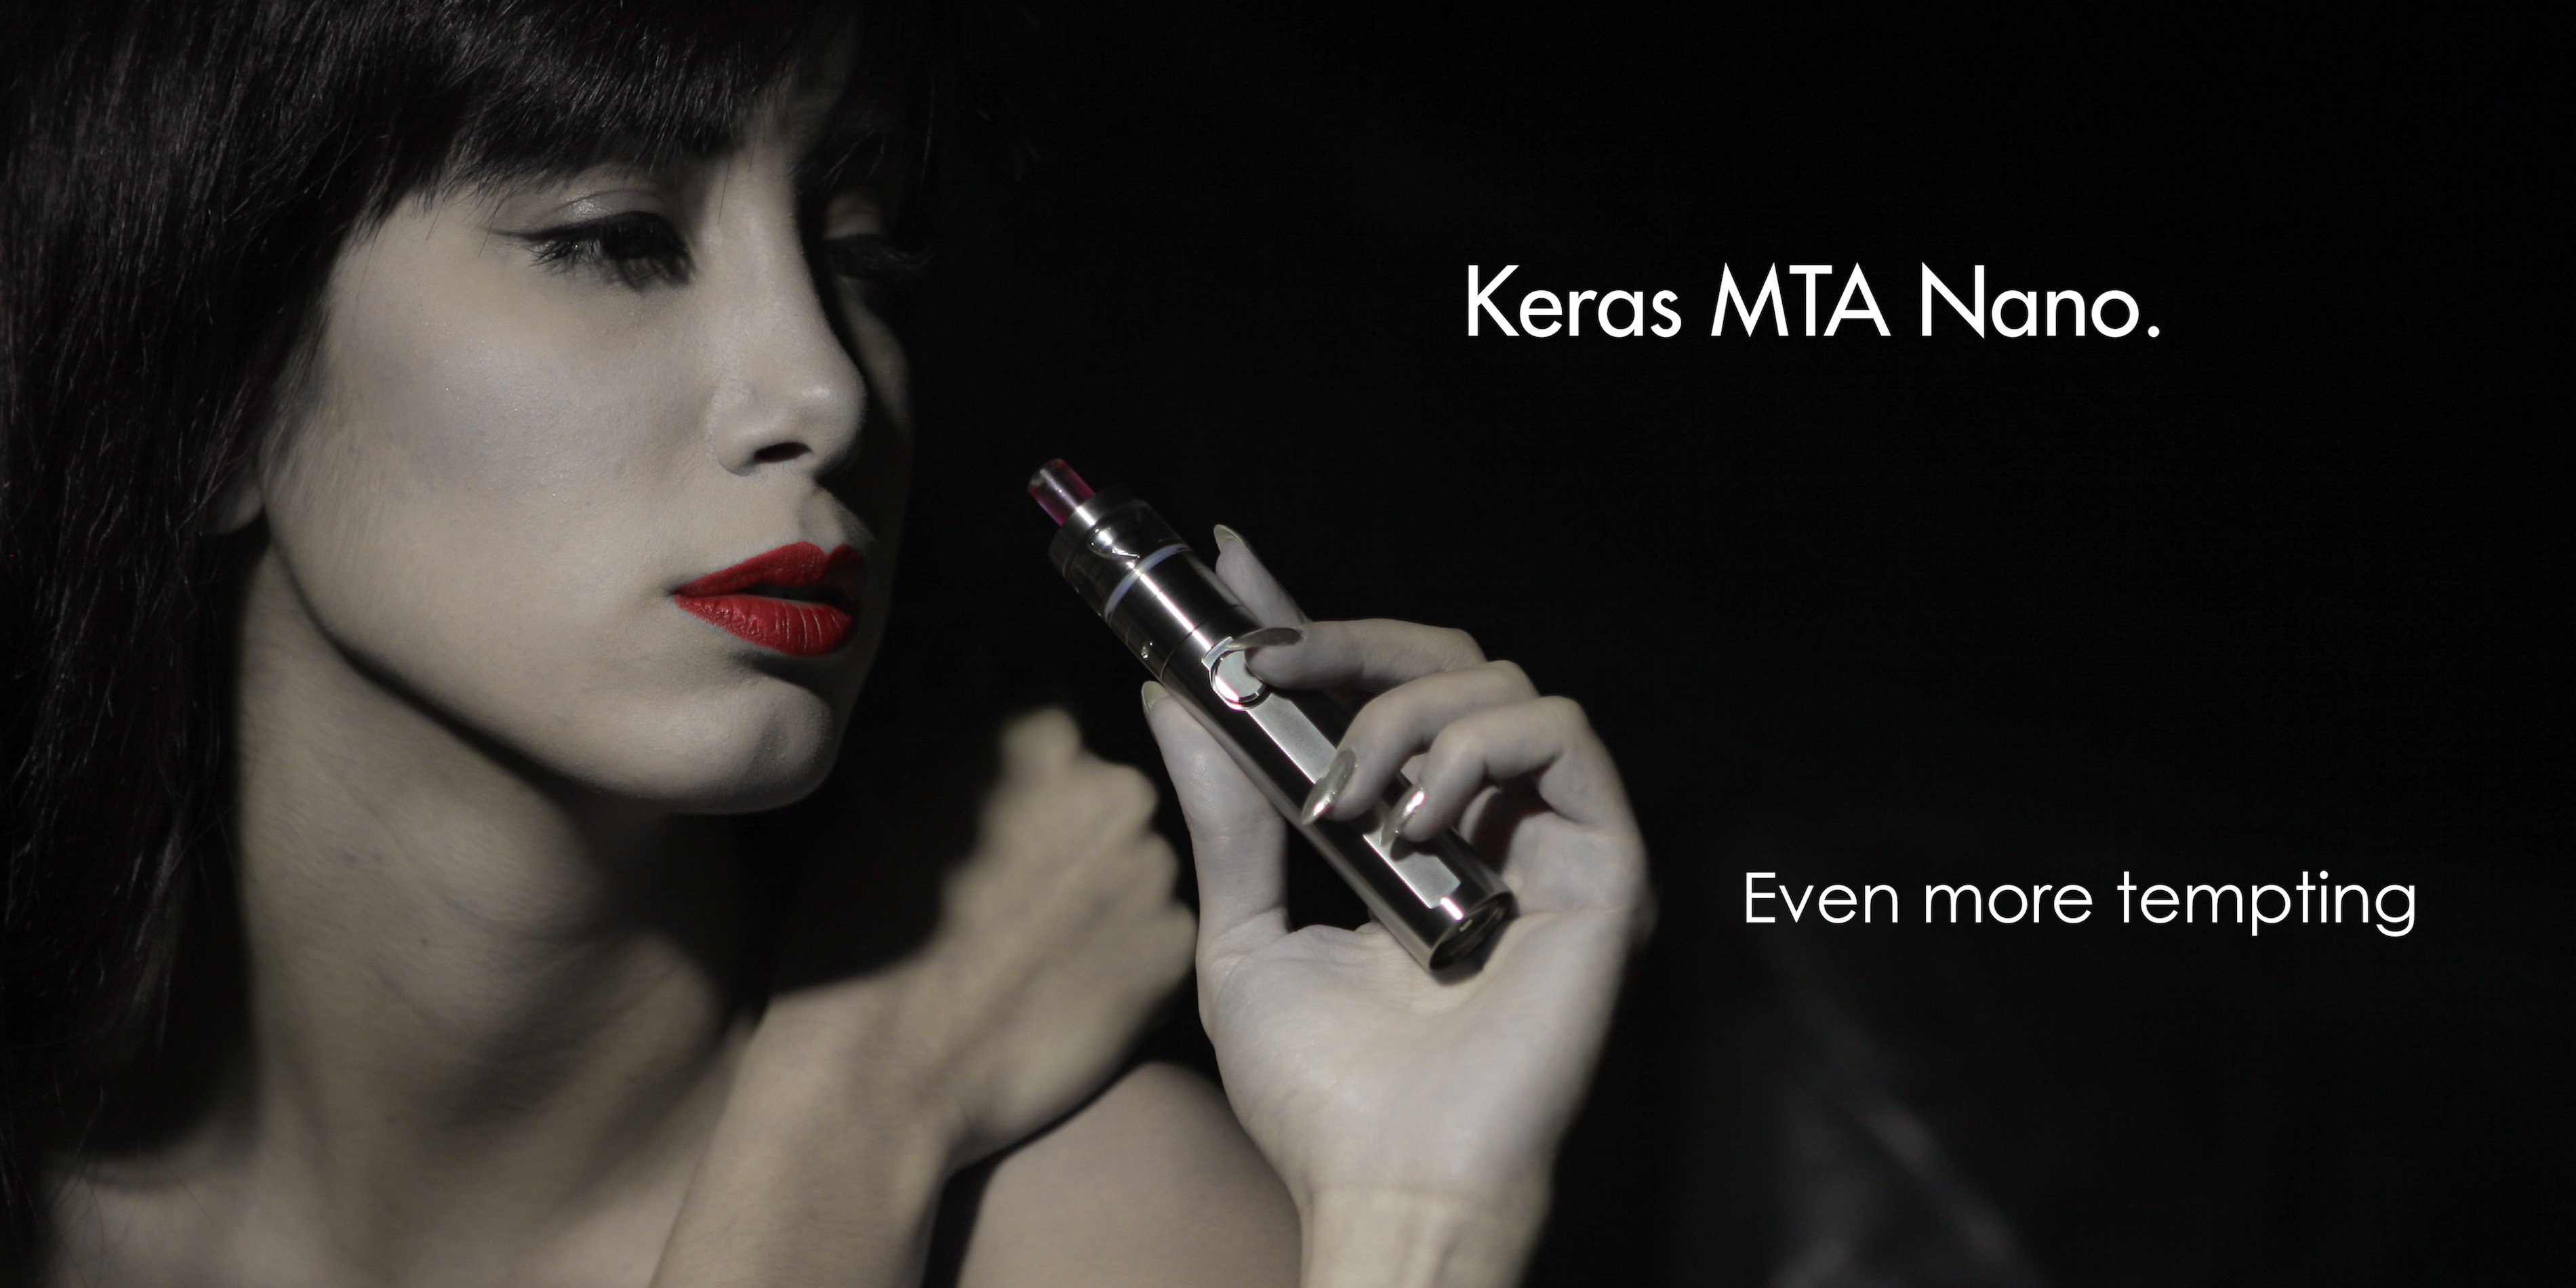 Keras Nano release